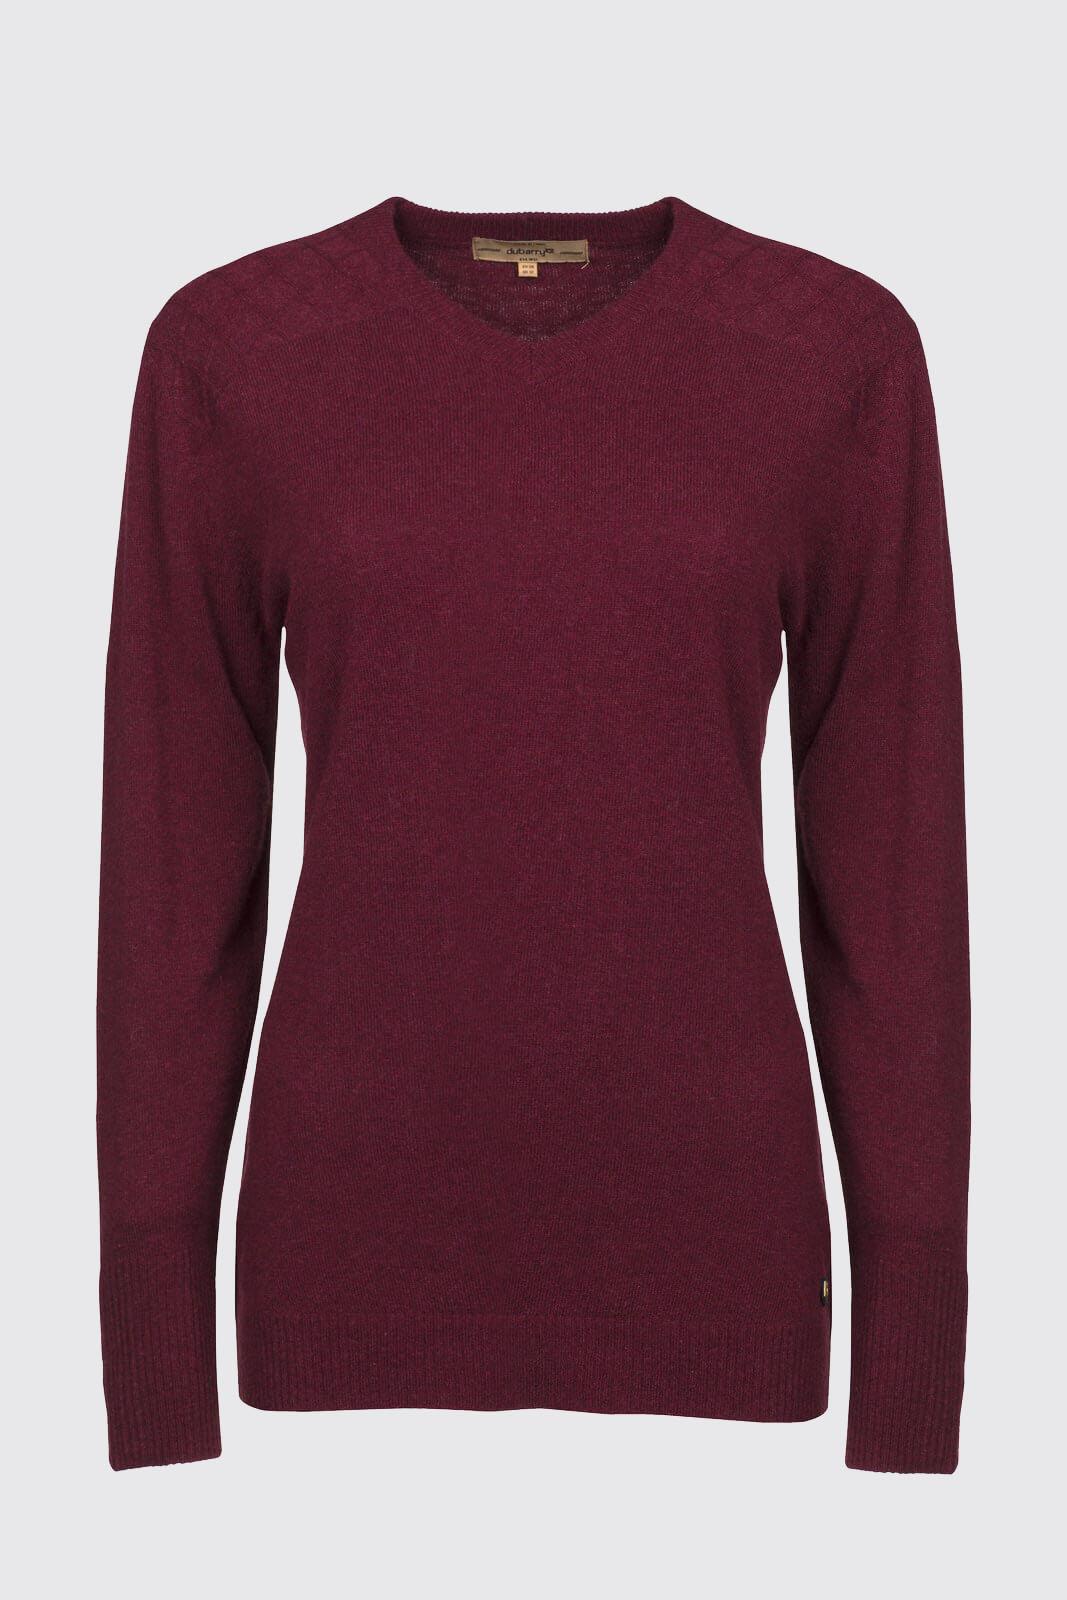 Blackwater Sweater - Malbec